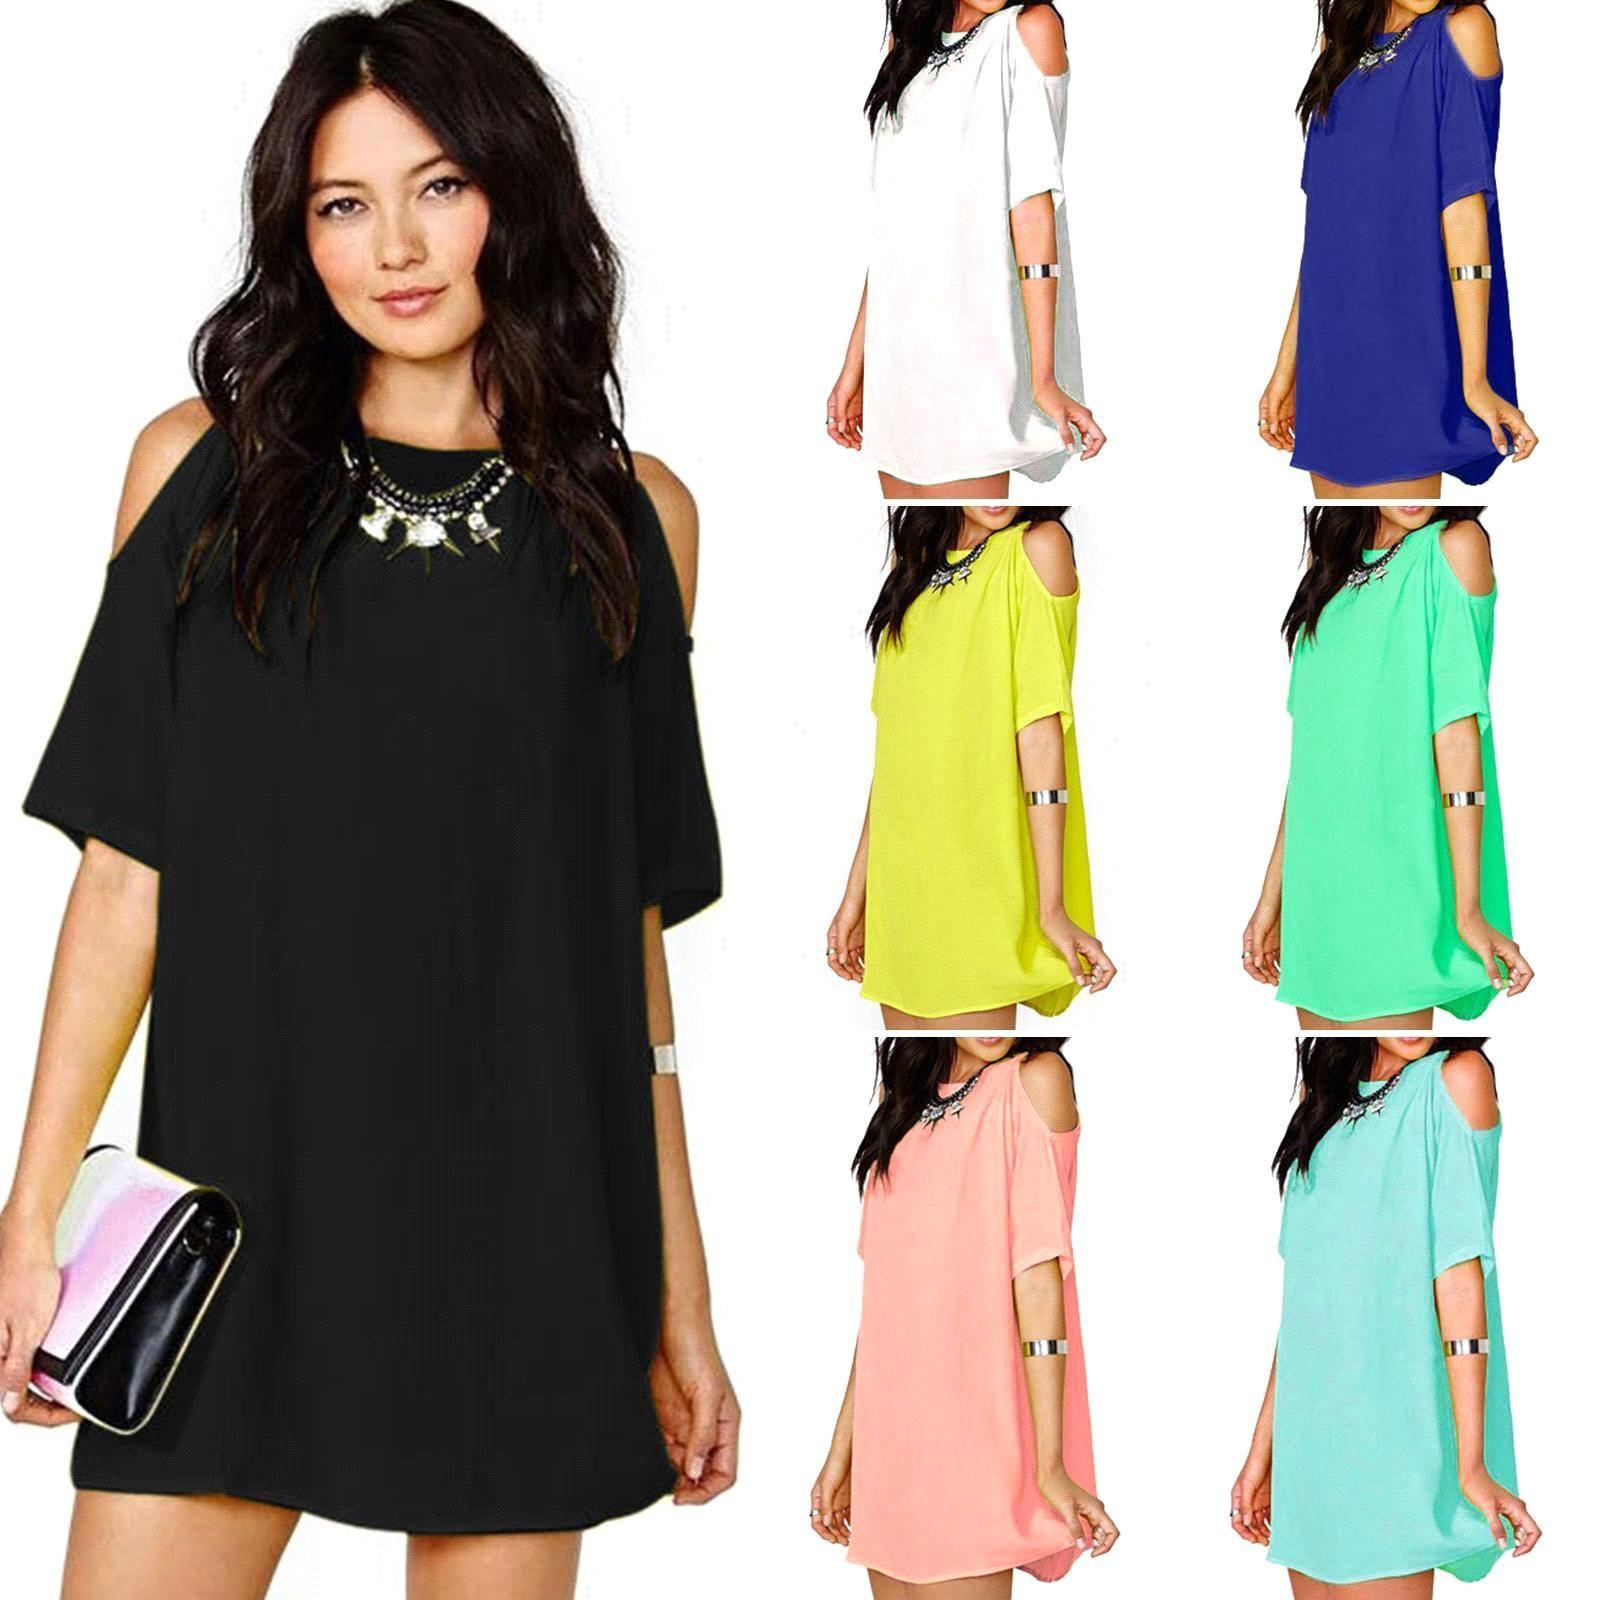 2016 Hot Sell Chiffon Casual Dresses Short Sleeves Short Mini ...